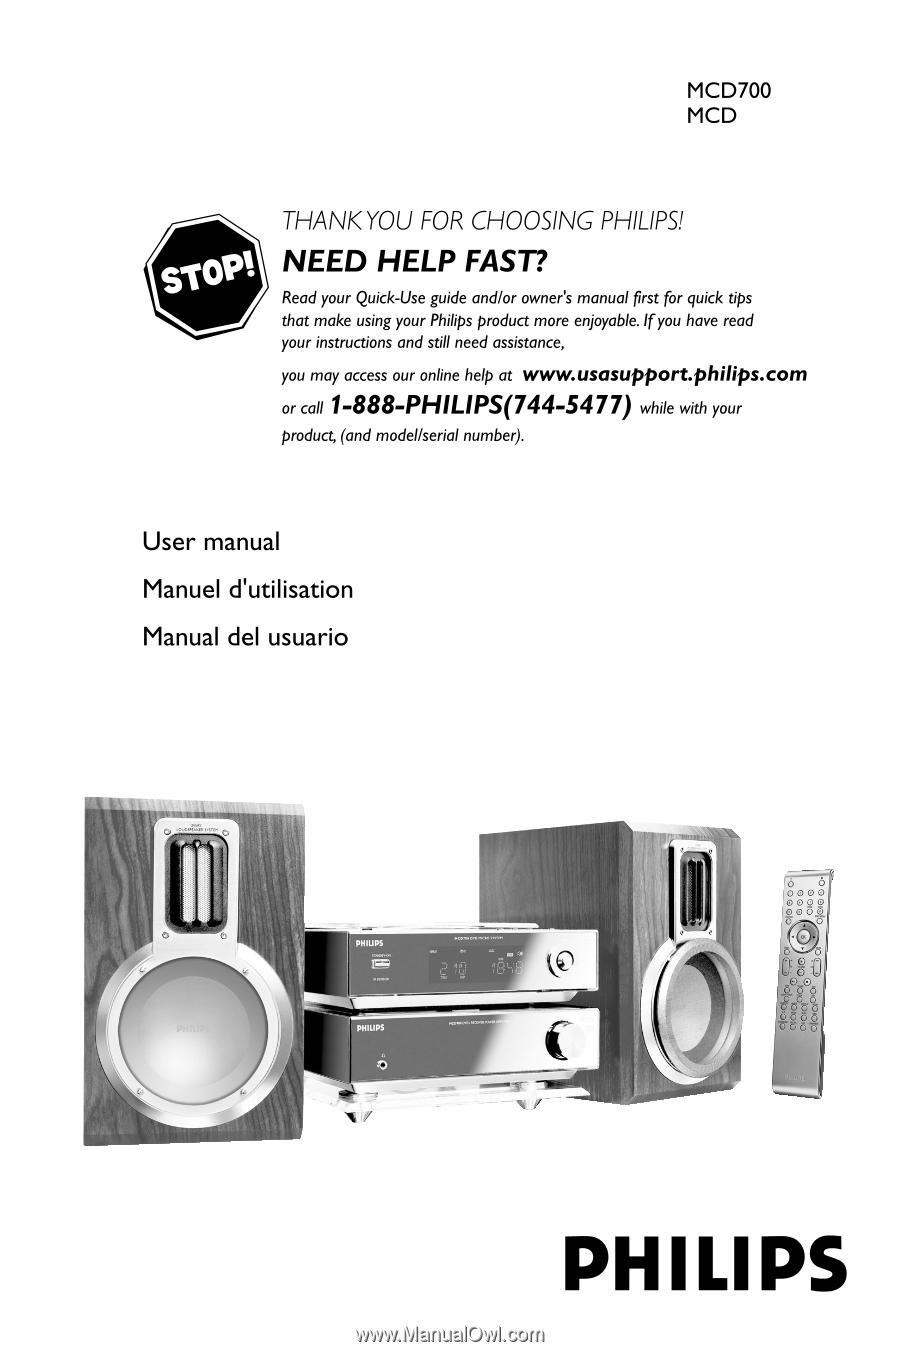 philips mcd702 user manual rh manualowl com Philips Electronics Manuals Philips Universal Remote Code Manual